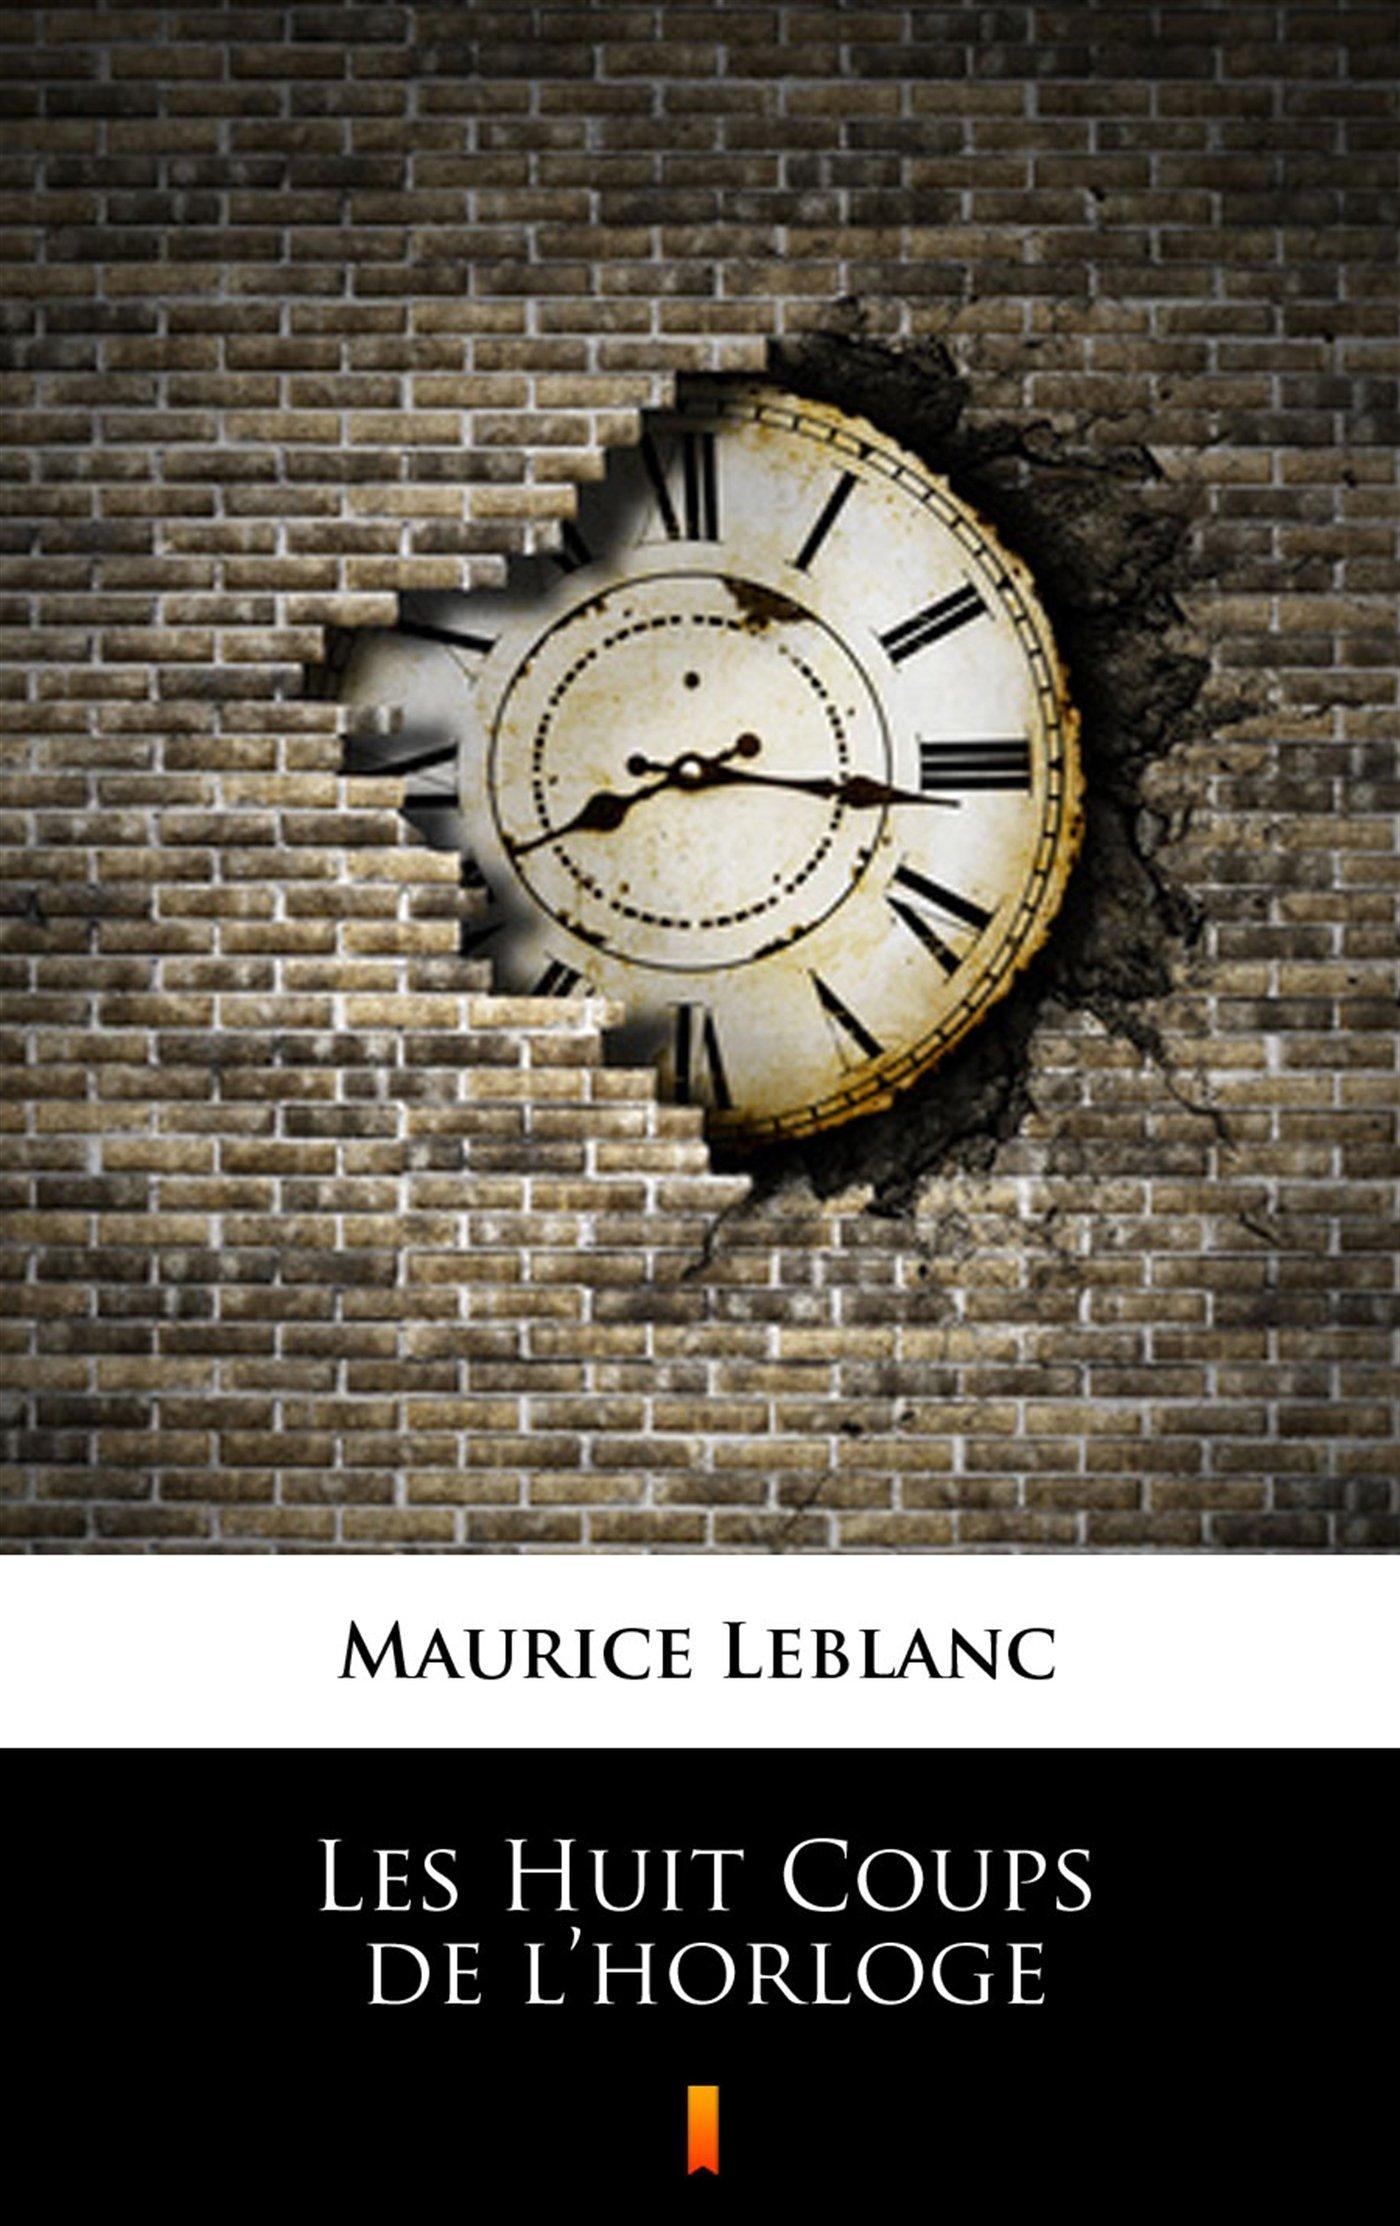 Les Huit Coups de l horloge - Ebook (Książka na Kindle) do pobrania w formacie MOBI